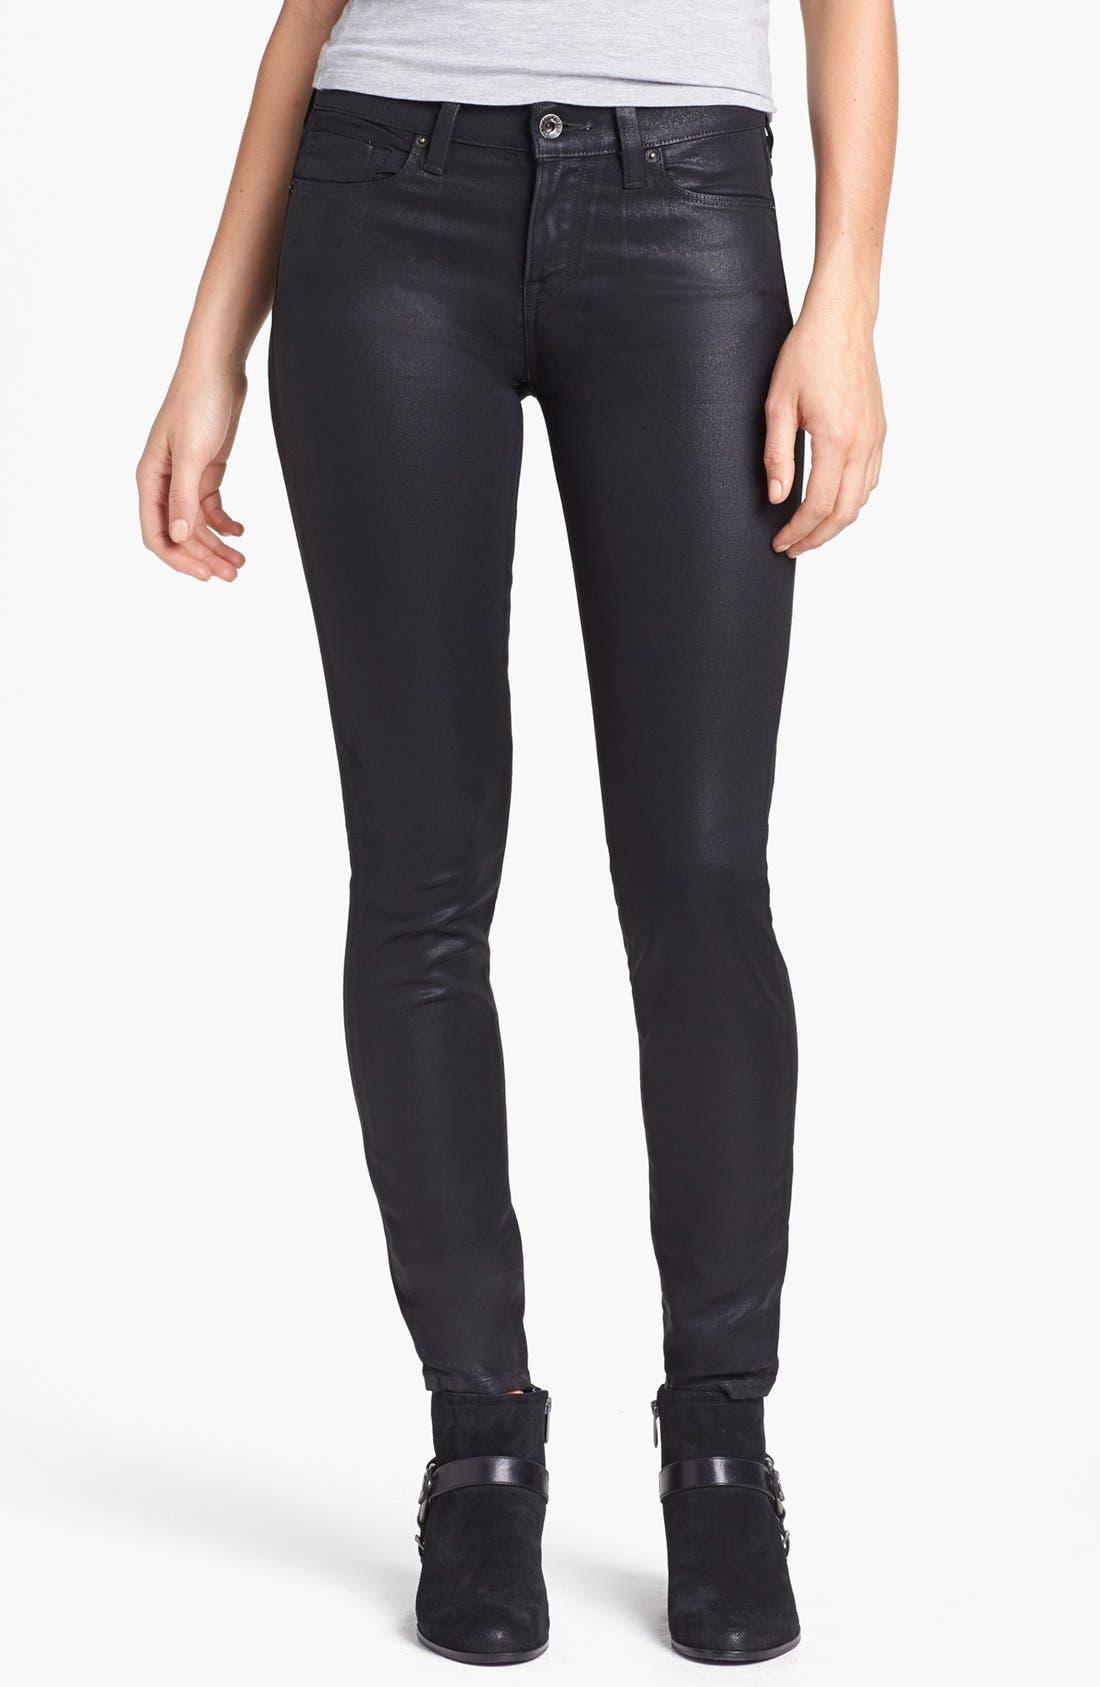 Alternate Image 1 Selected - Lucky Brand 'Sofia' Coated Skinny Jeans (Black)